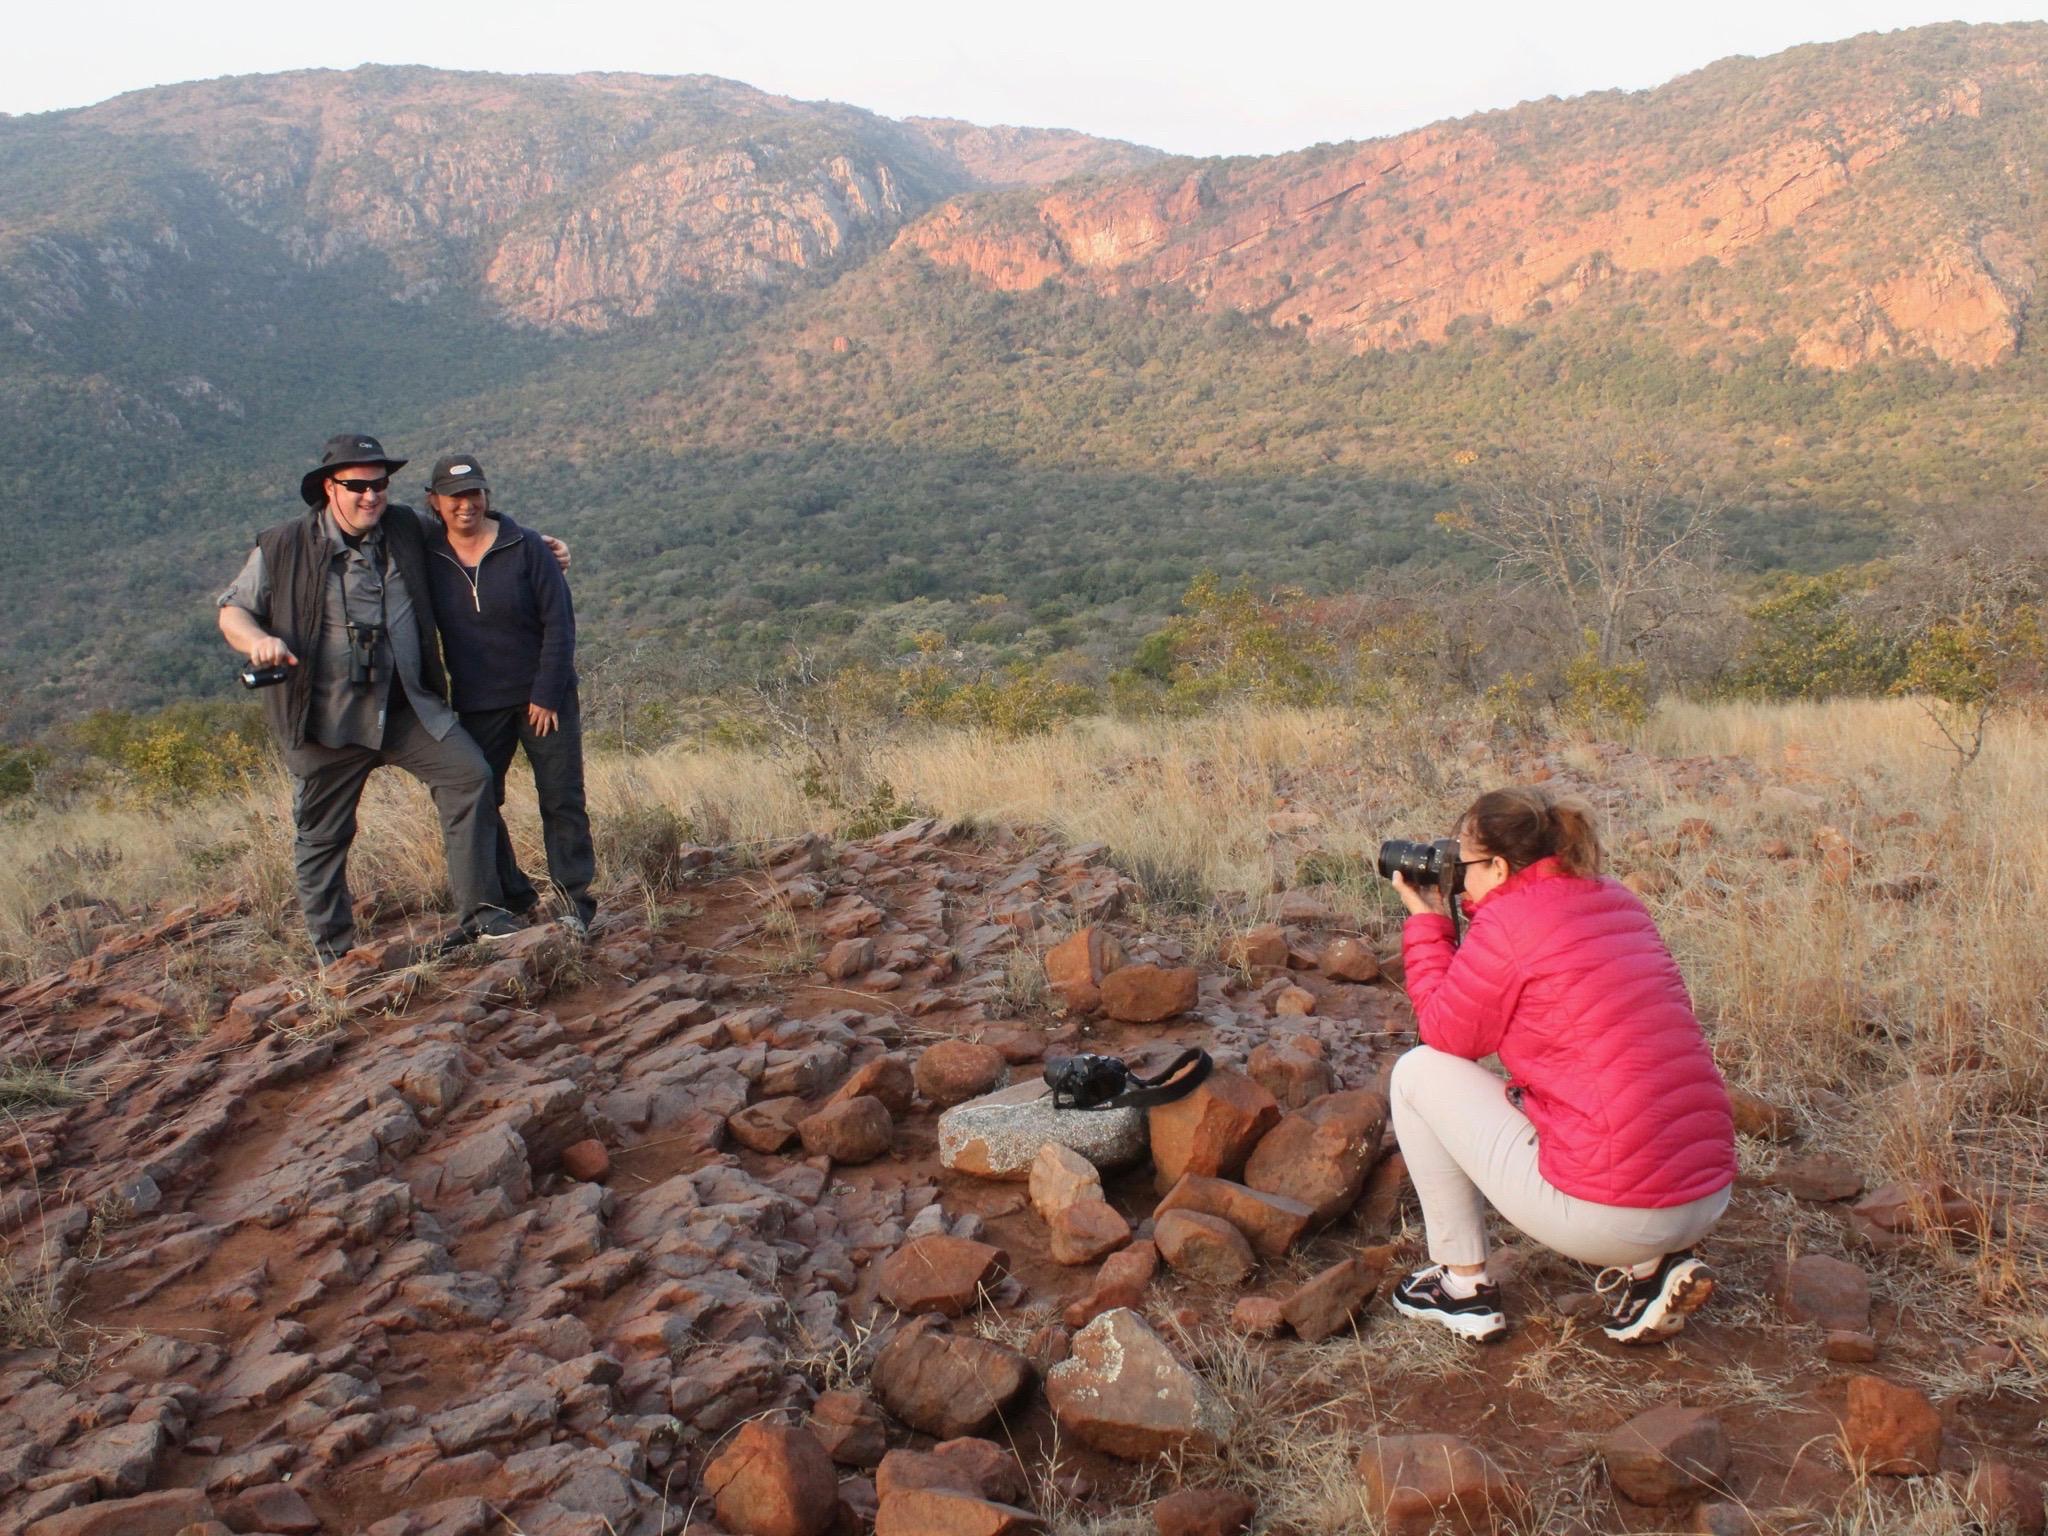 Safari guests having a photo taken